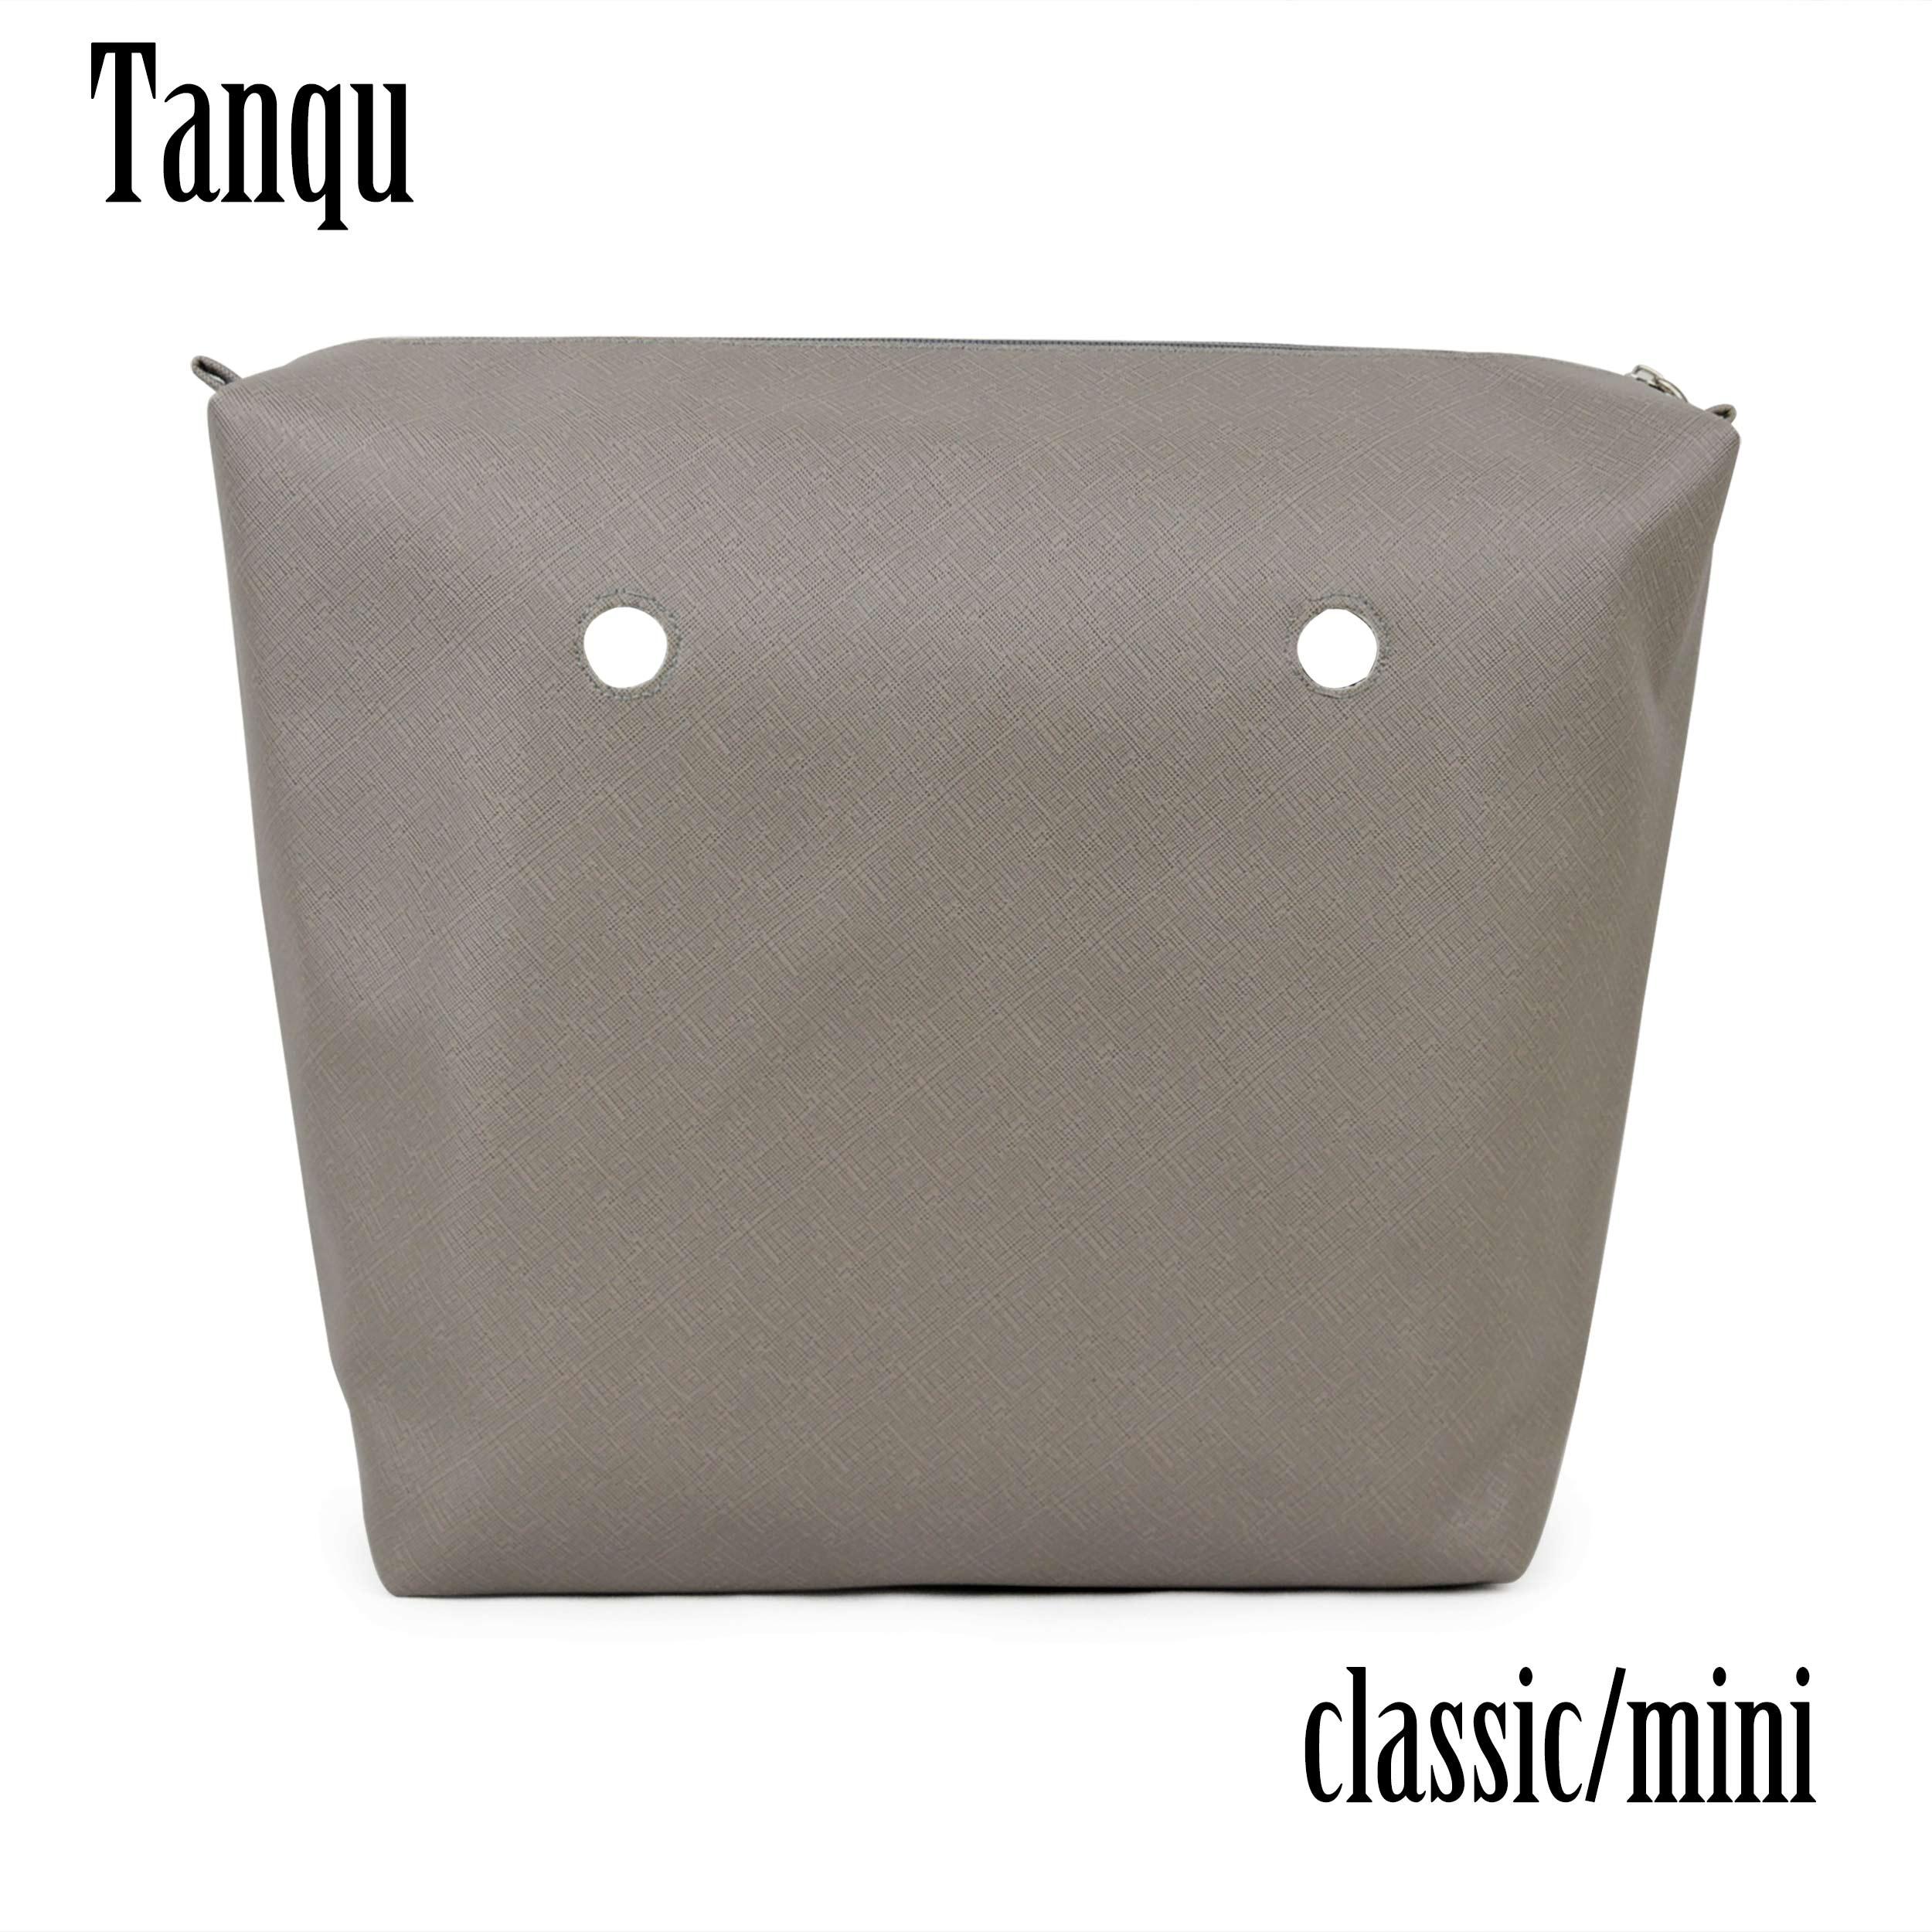 TANQU-بطانة داخلية من جلد البولي يوريثان ، جيب بسحاب مقاوم للماء لـ Obag ، بطانة صغيرة كلاسيكية ، ملحق للحقيبة